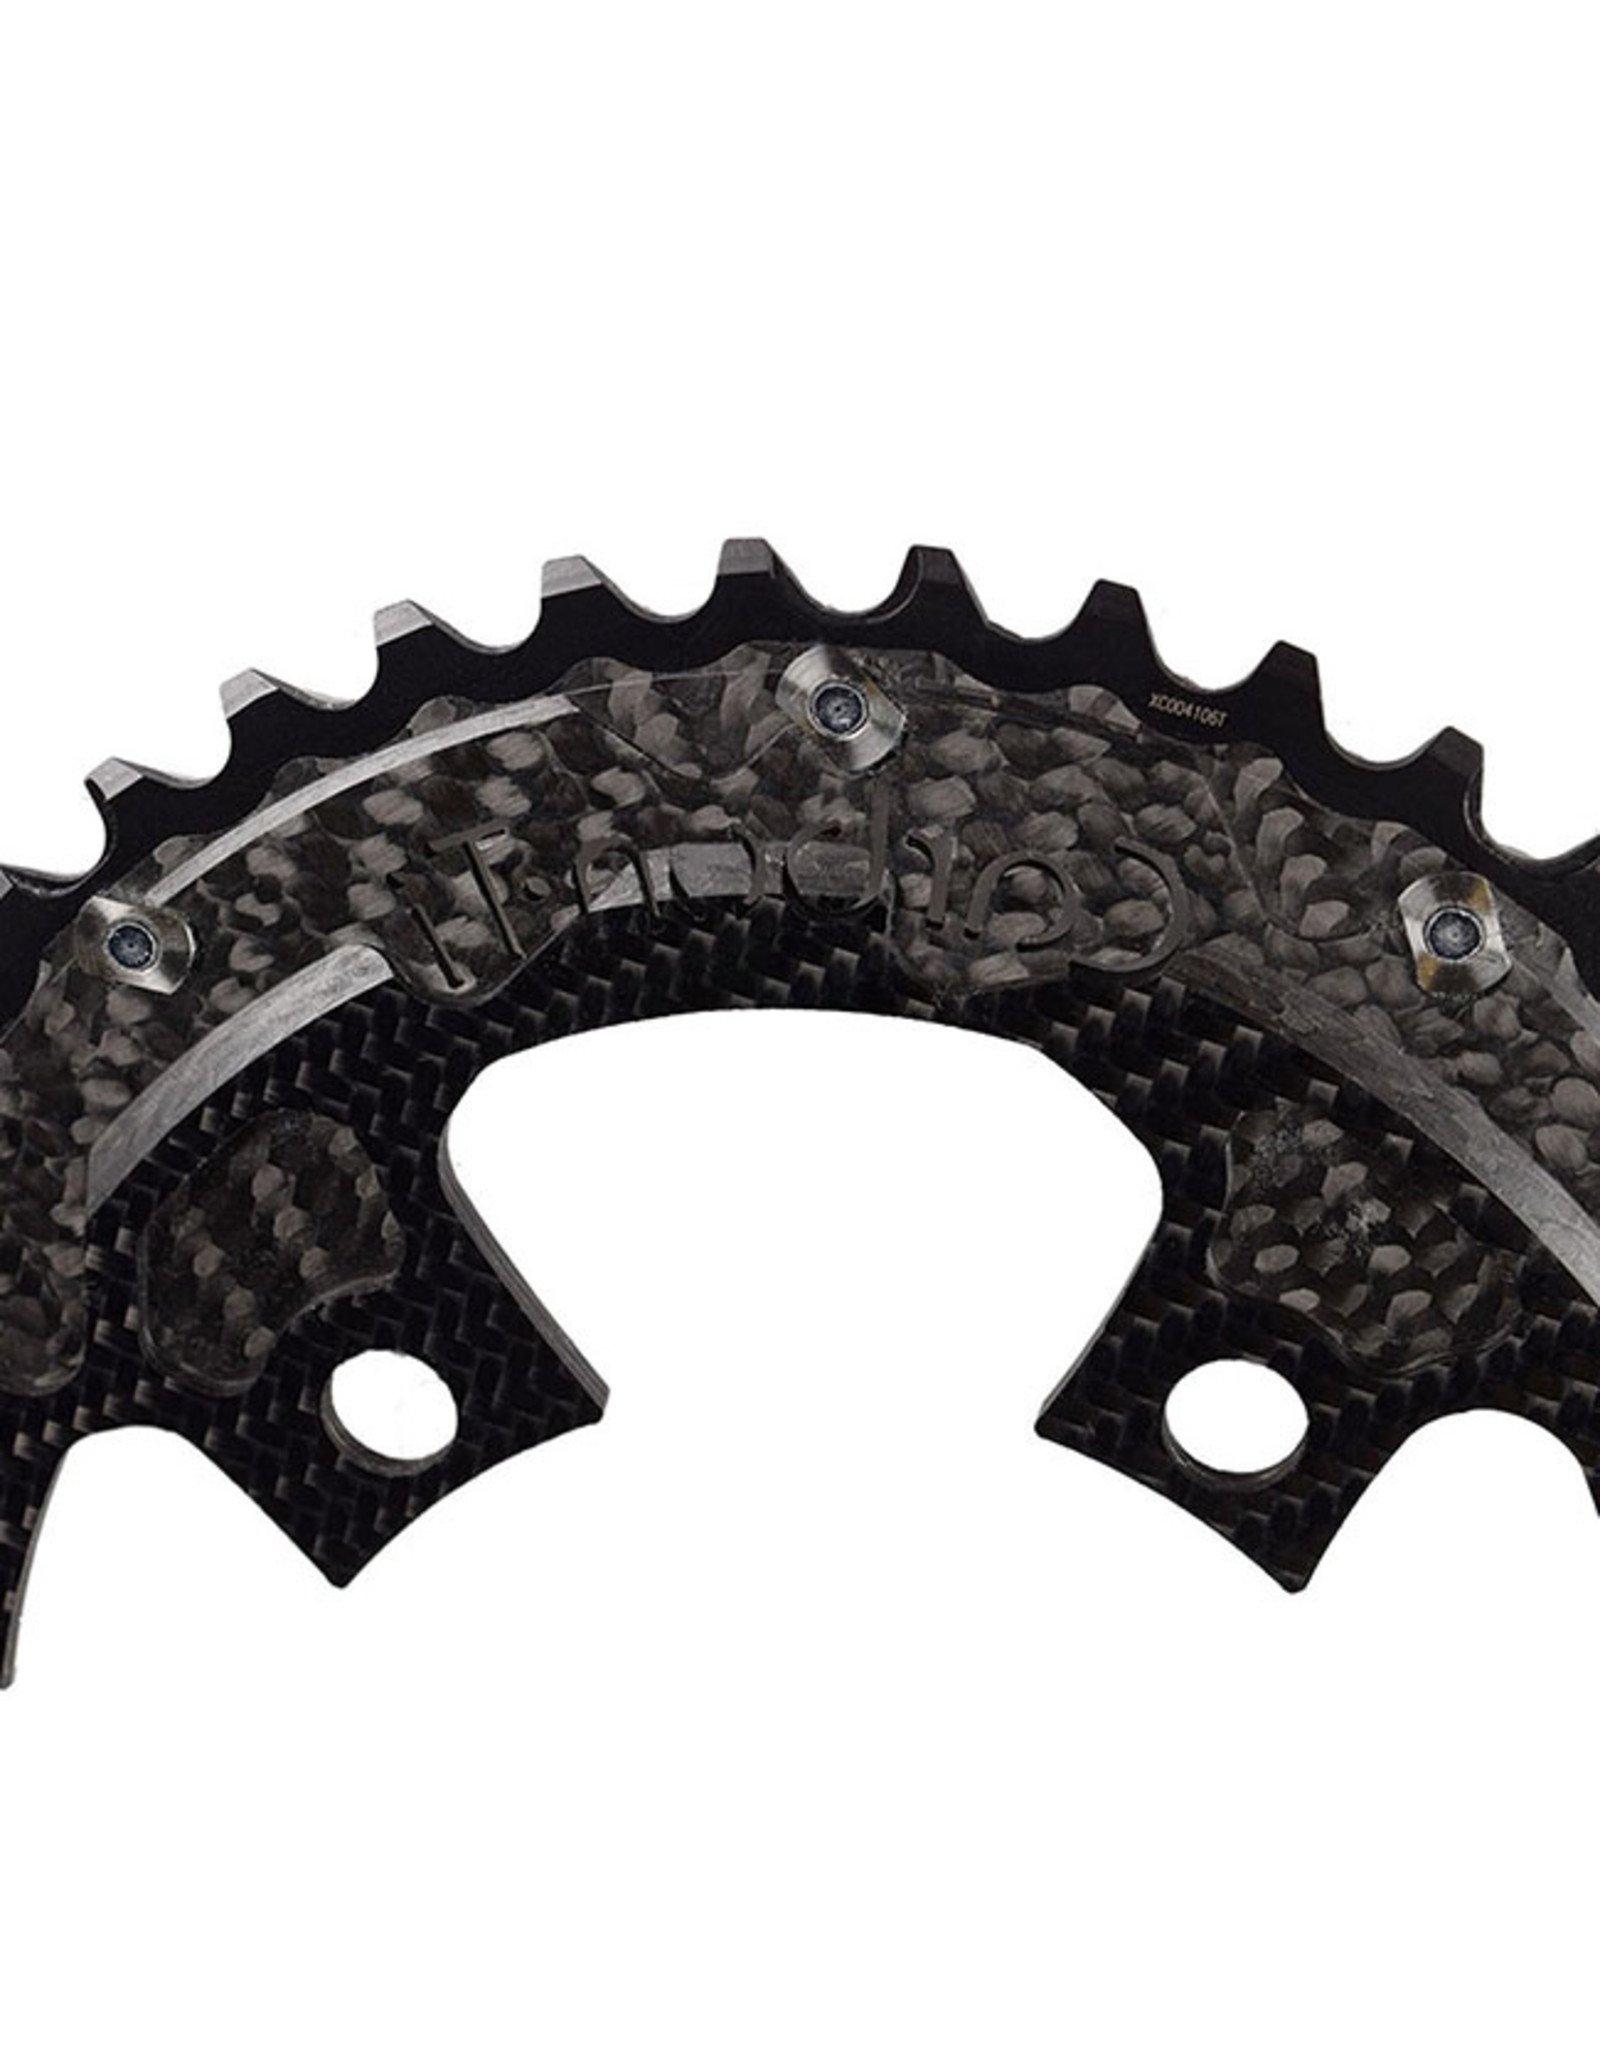 Carbon-Ti Carbon-Ti X-CarboCam 4-Arm Oval Carbon Road Chainrings